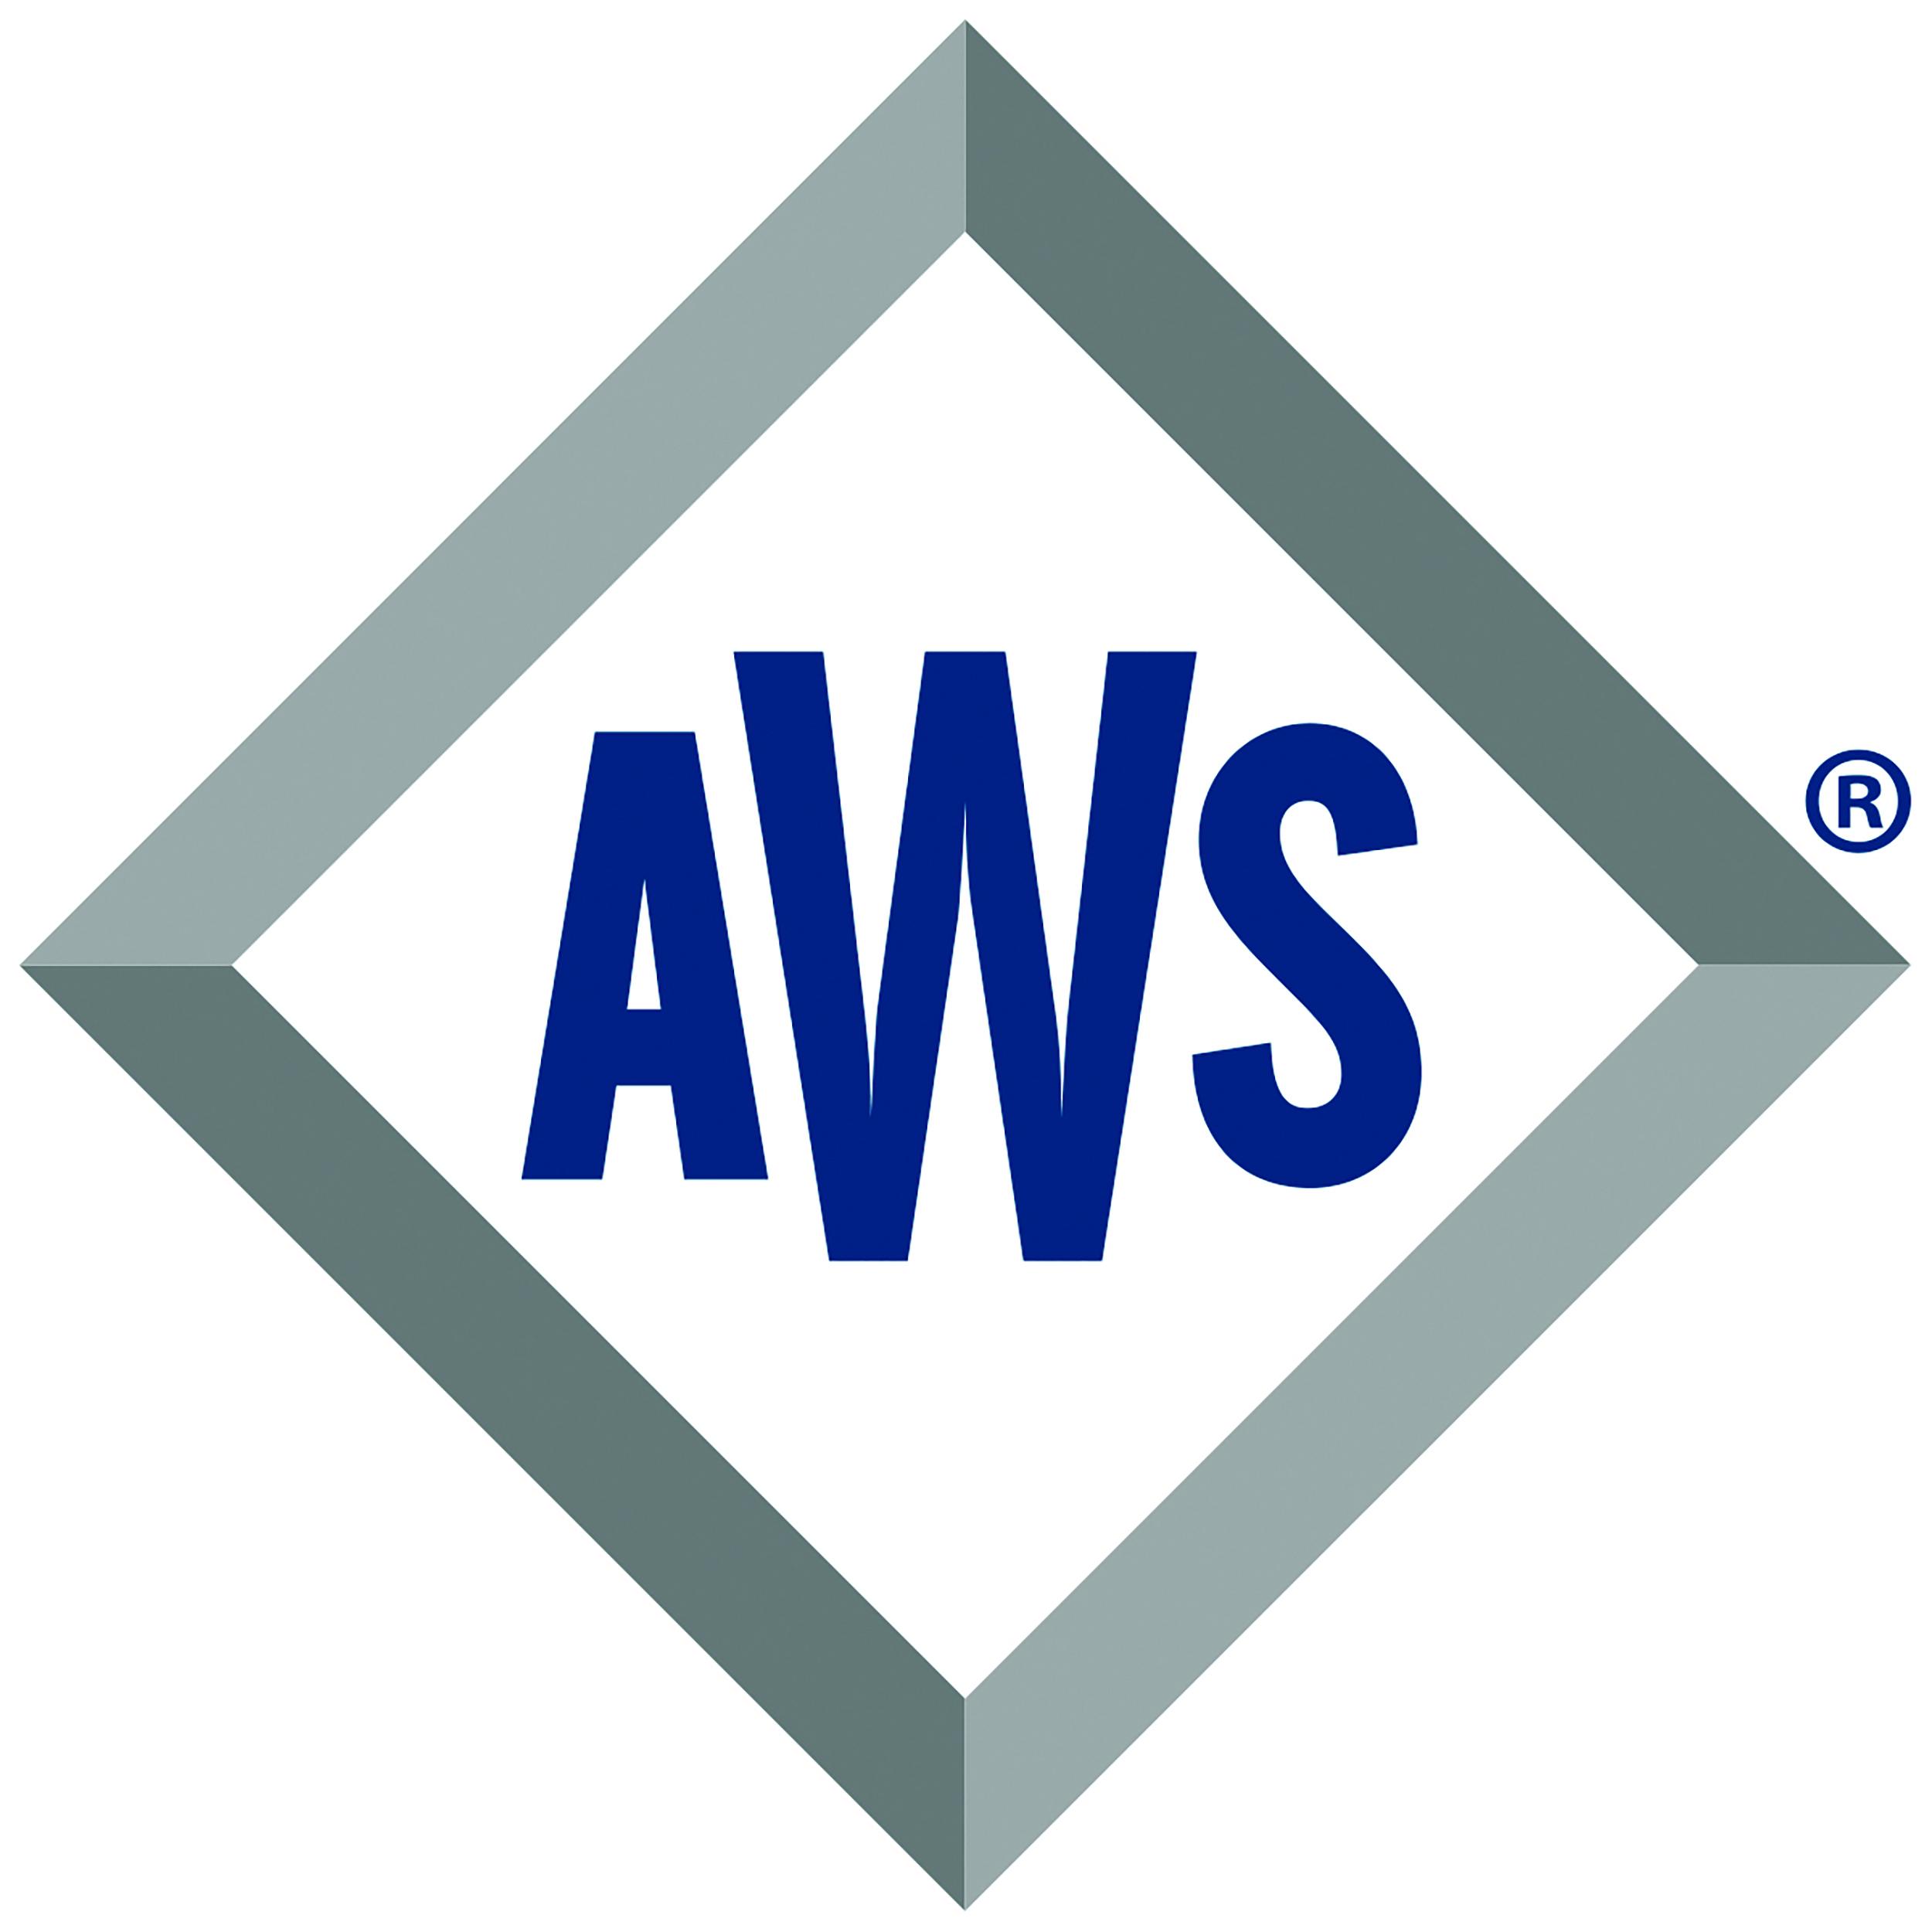 aws-diamond-logo-2500x2500.jpg